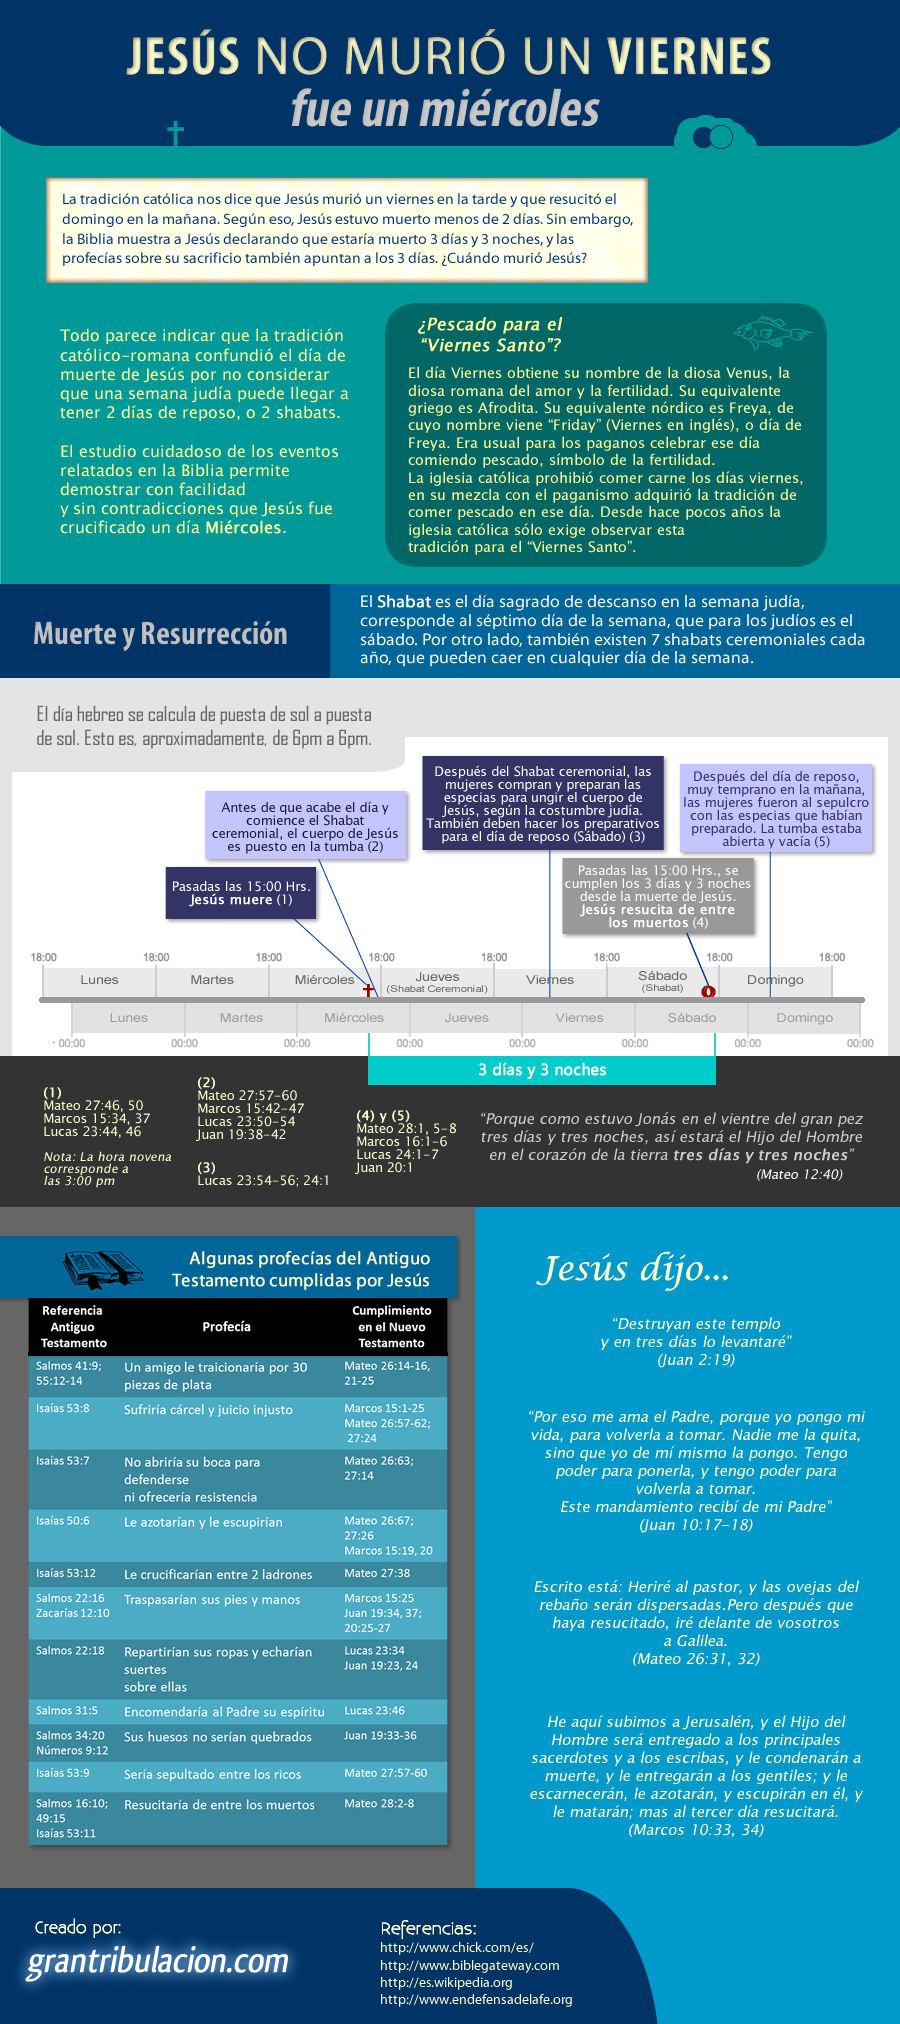 Jesús no murió un Viernes